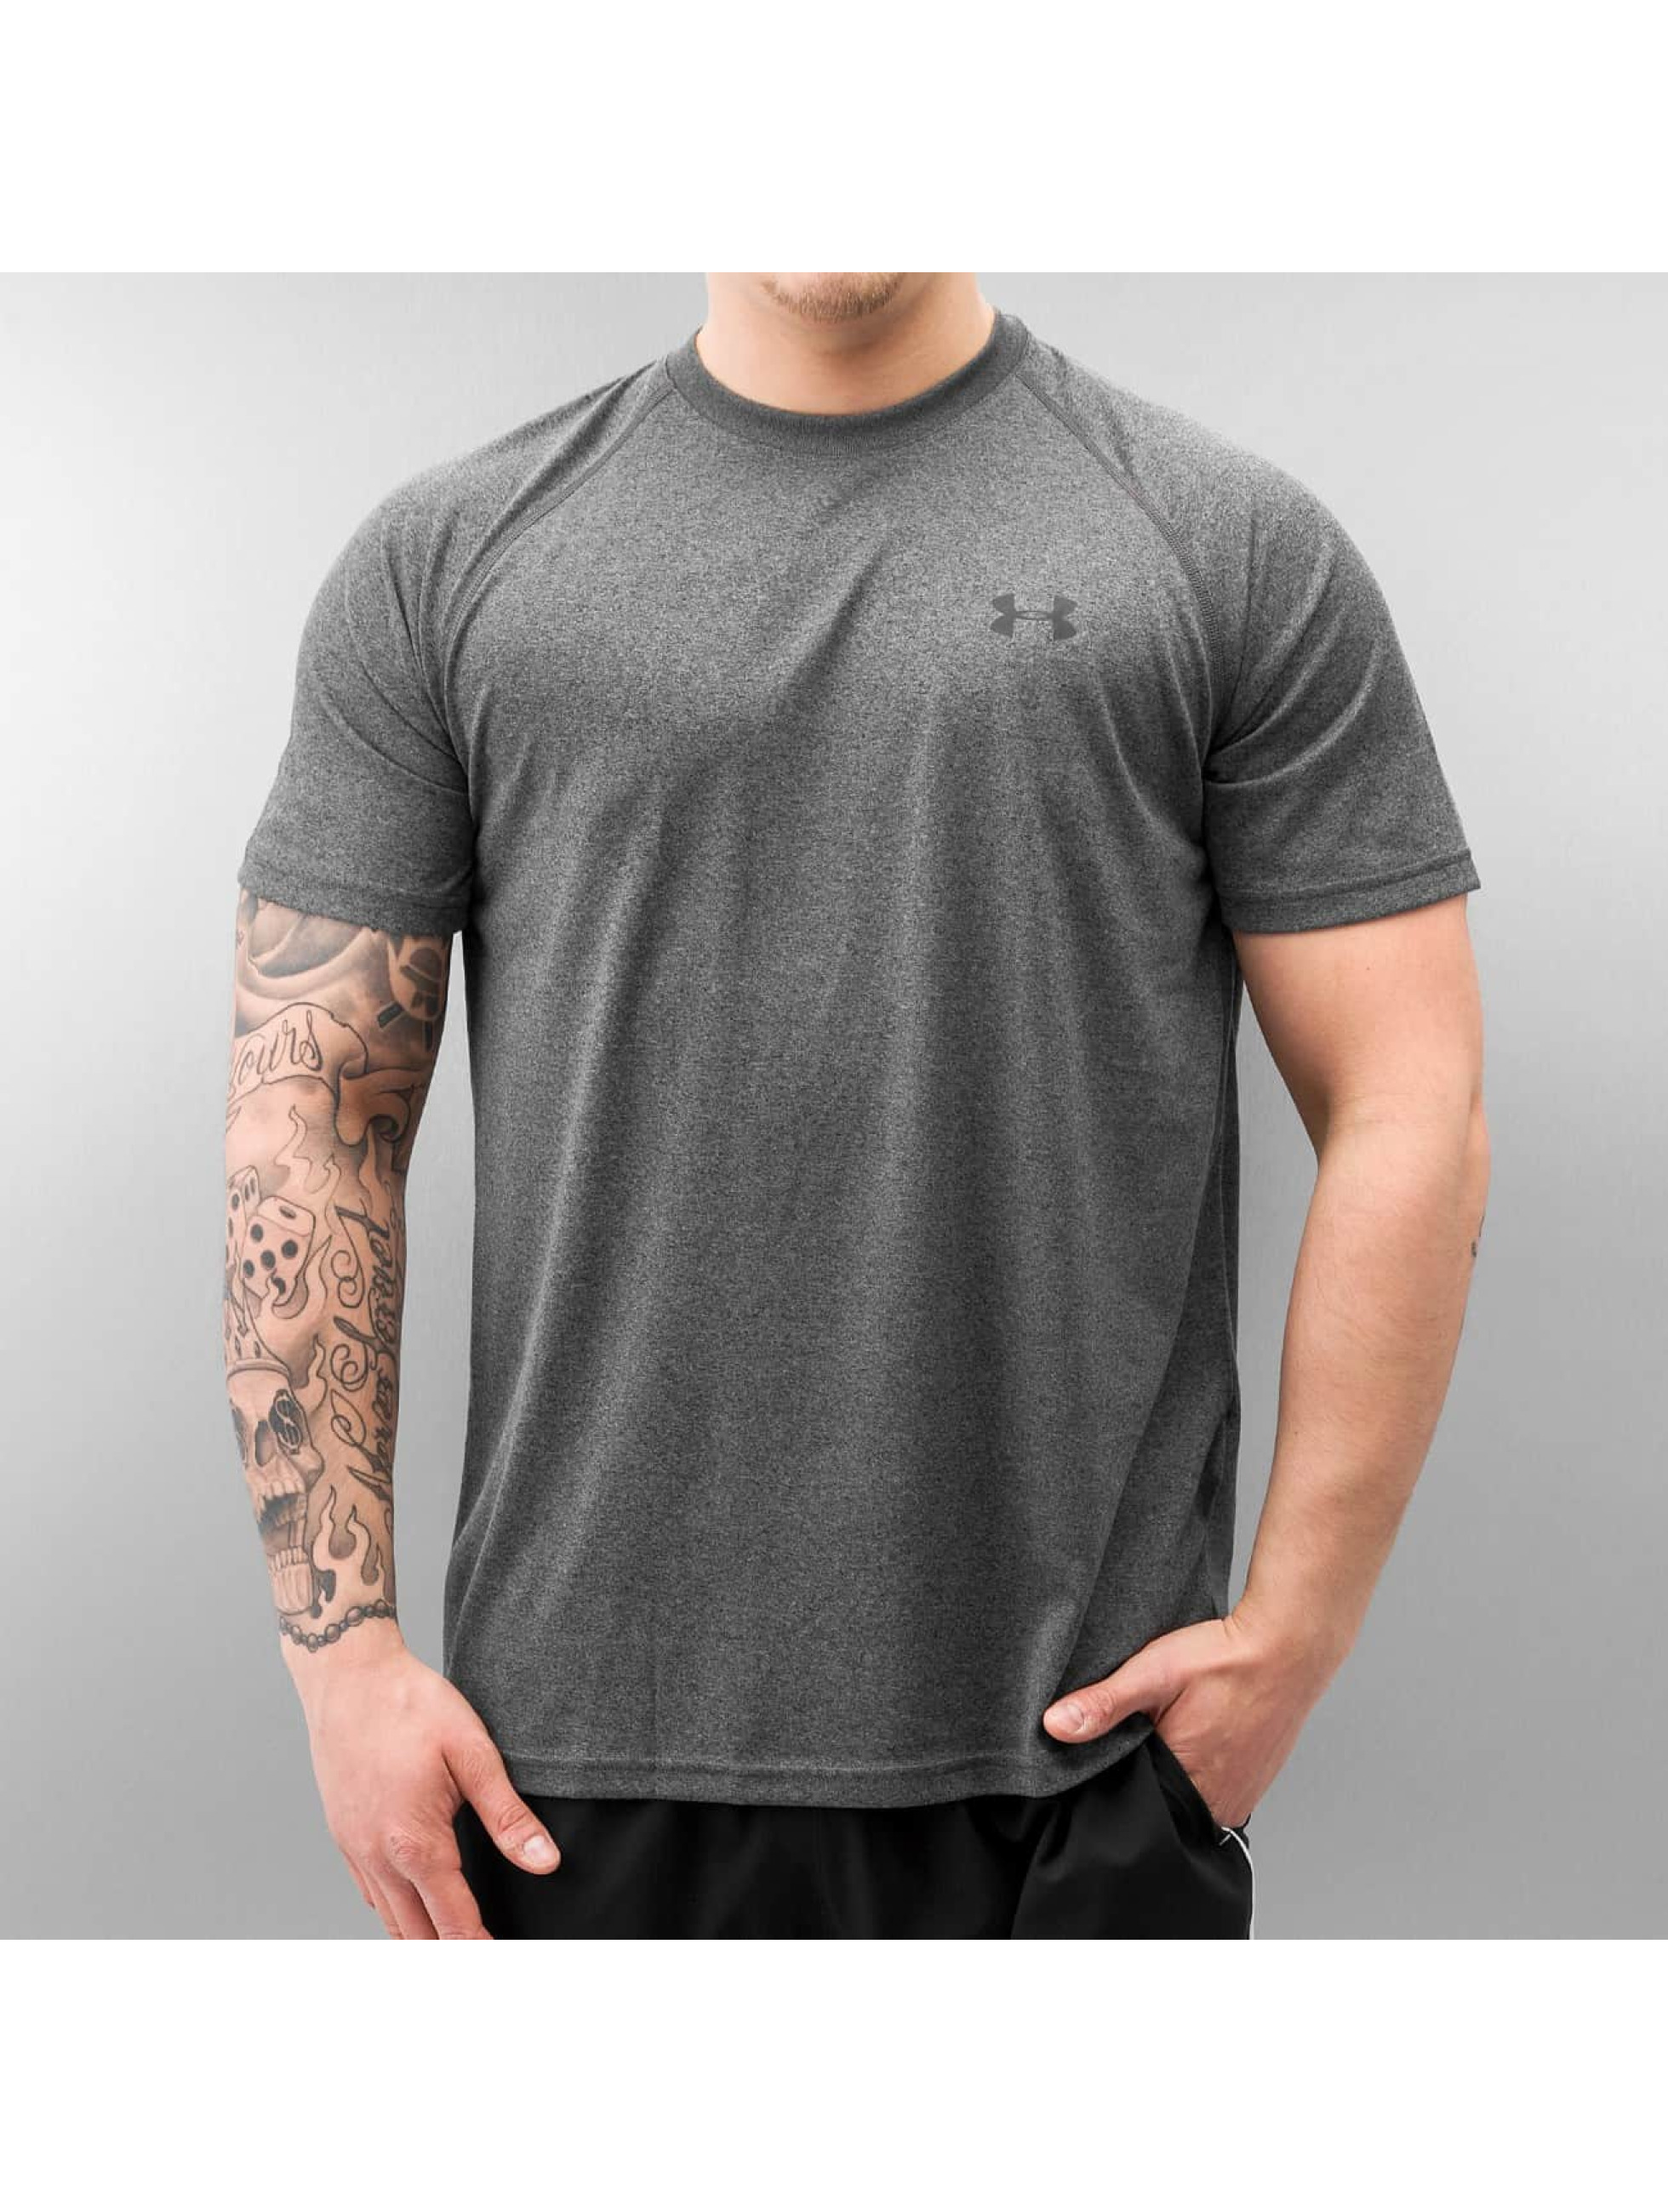 Under armour tech gris homme t shirt 210250 for Original under armour shirt